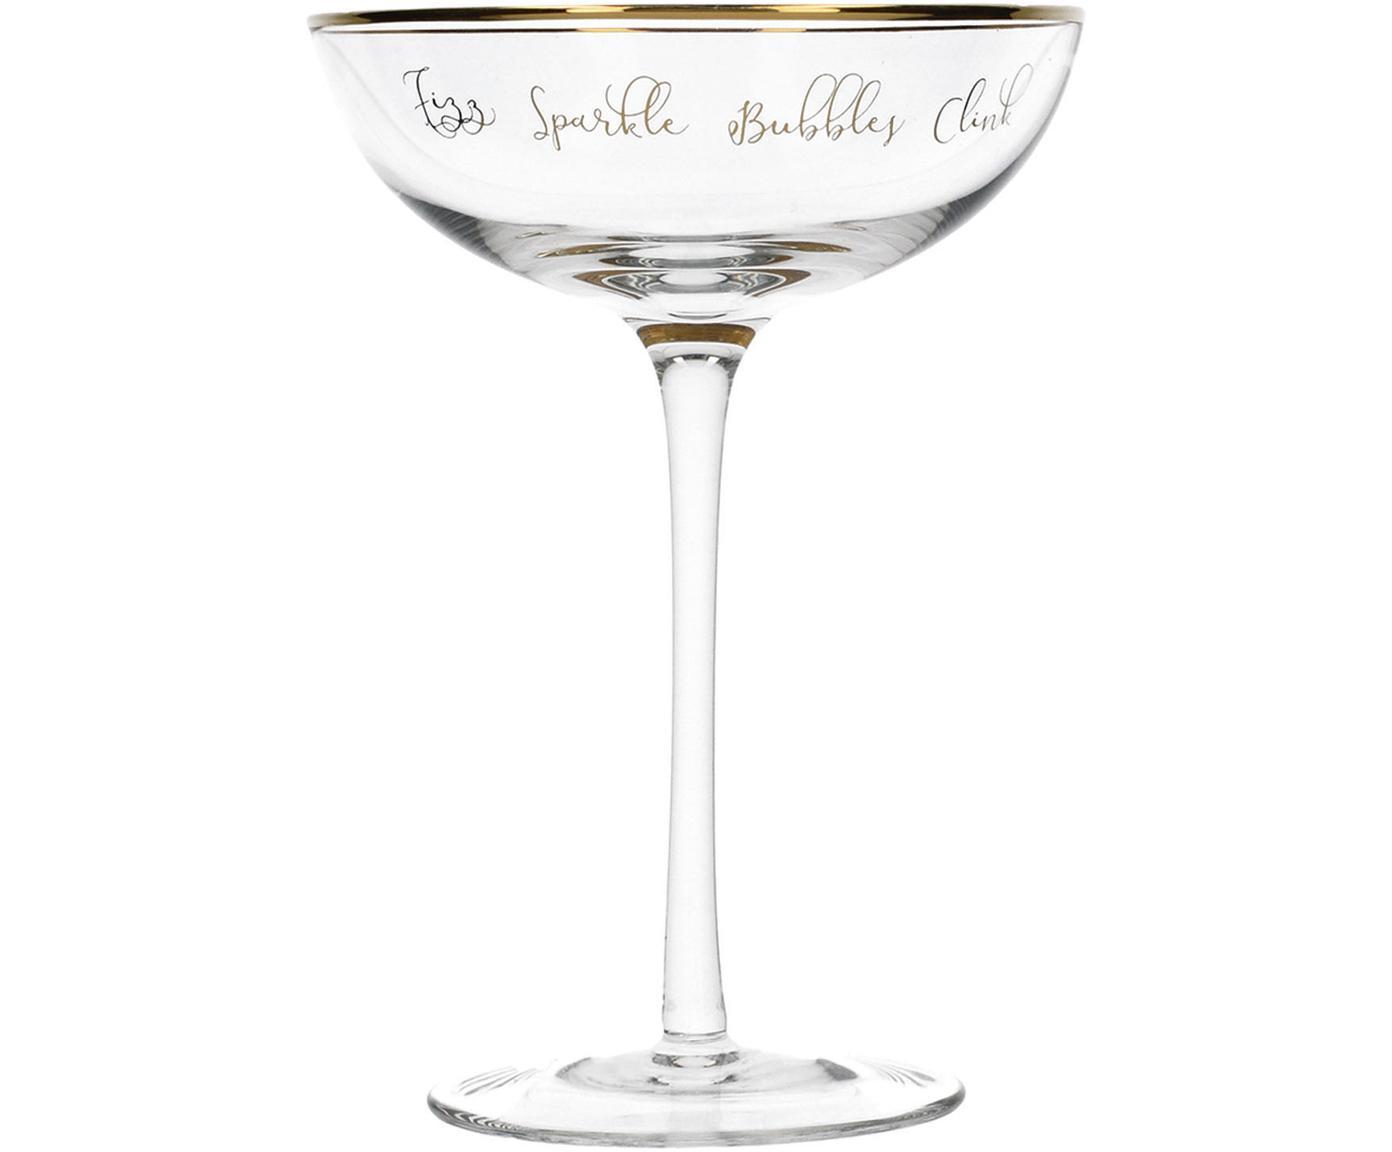 ChampagneglazenFizz Sparkle Pop Clink met goudkleurig opschrift, 2 stuks, Glas, Transparant, goudkleurig, Ø 12 x H 18 cm